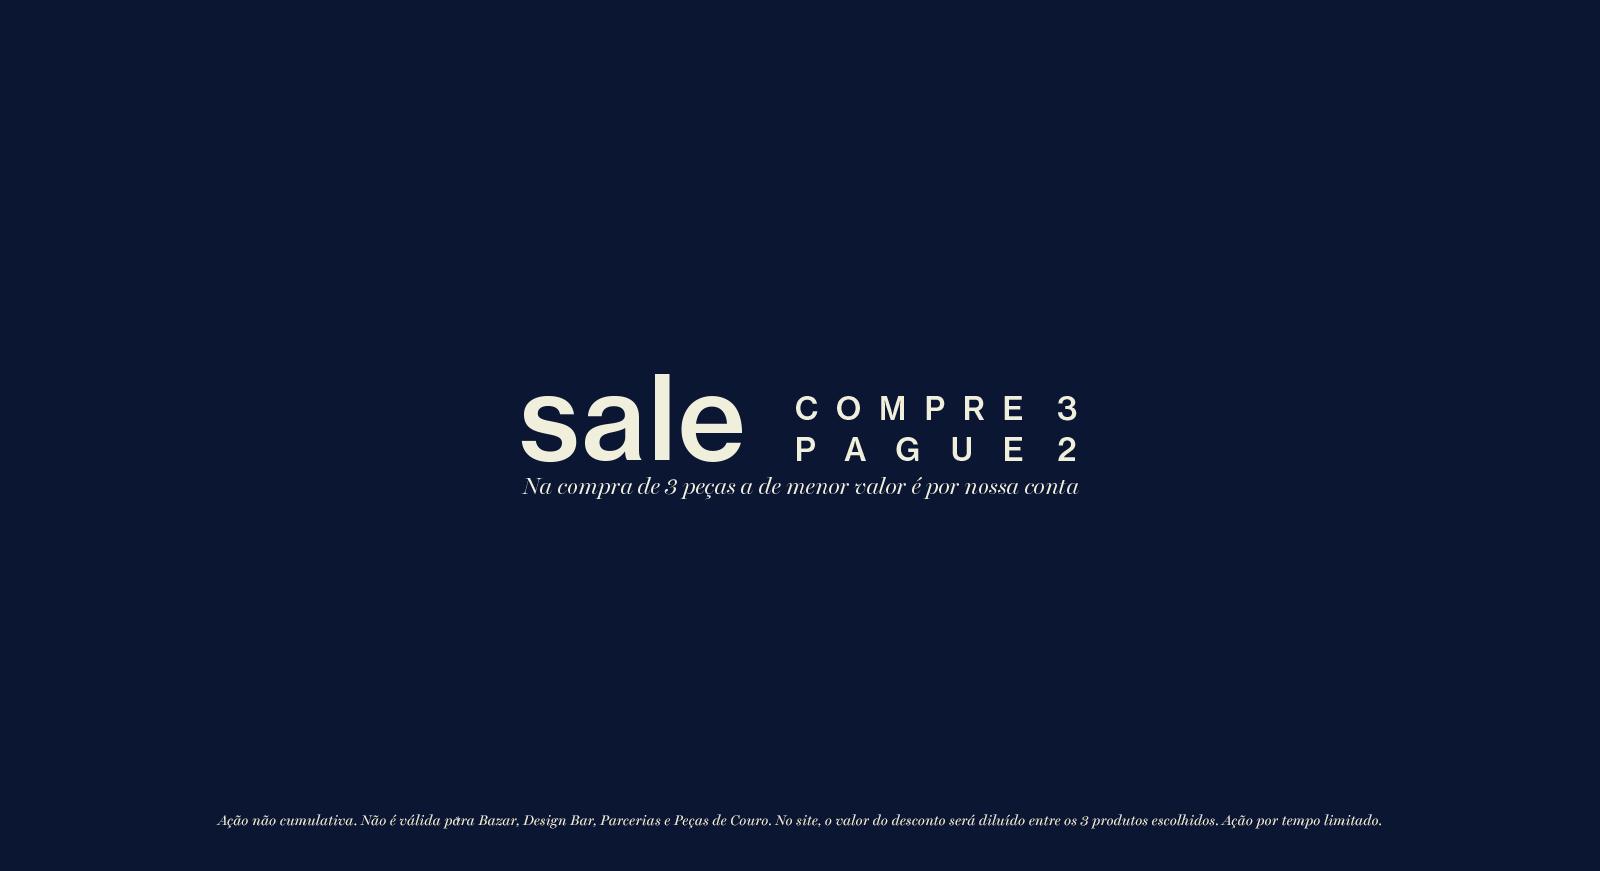 Sale L3P2